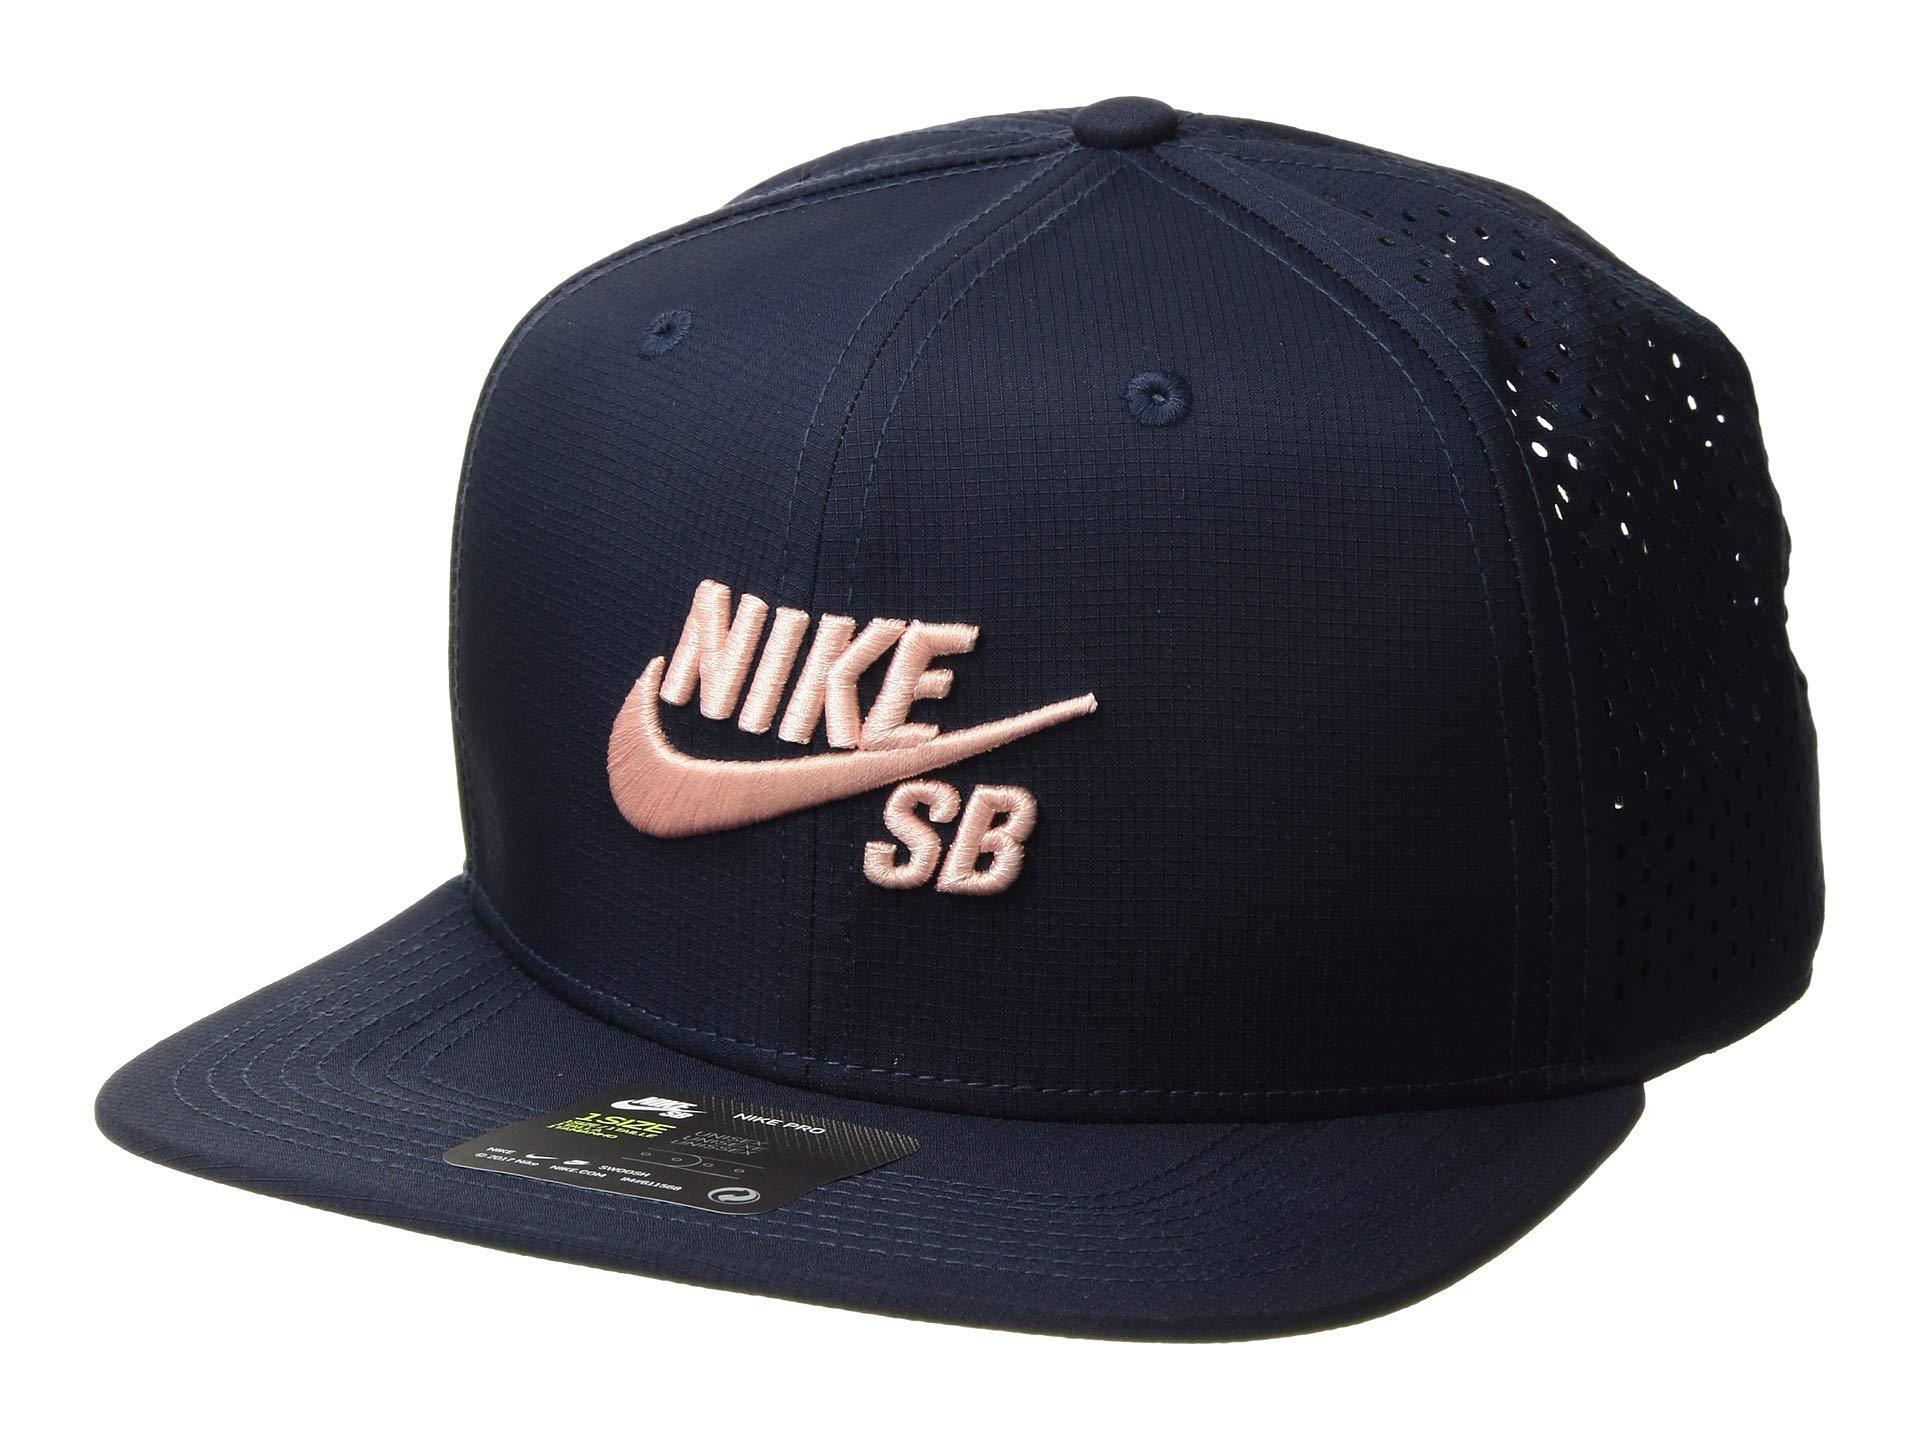 c428e93ad90 Lyst - Nike Performance Trucker Hat (black black black white) Caps ...